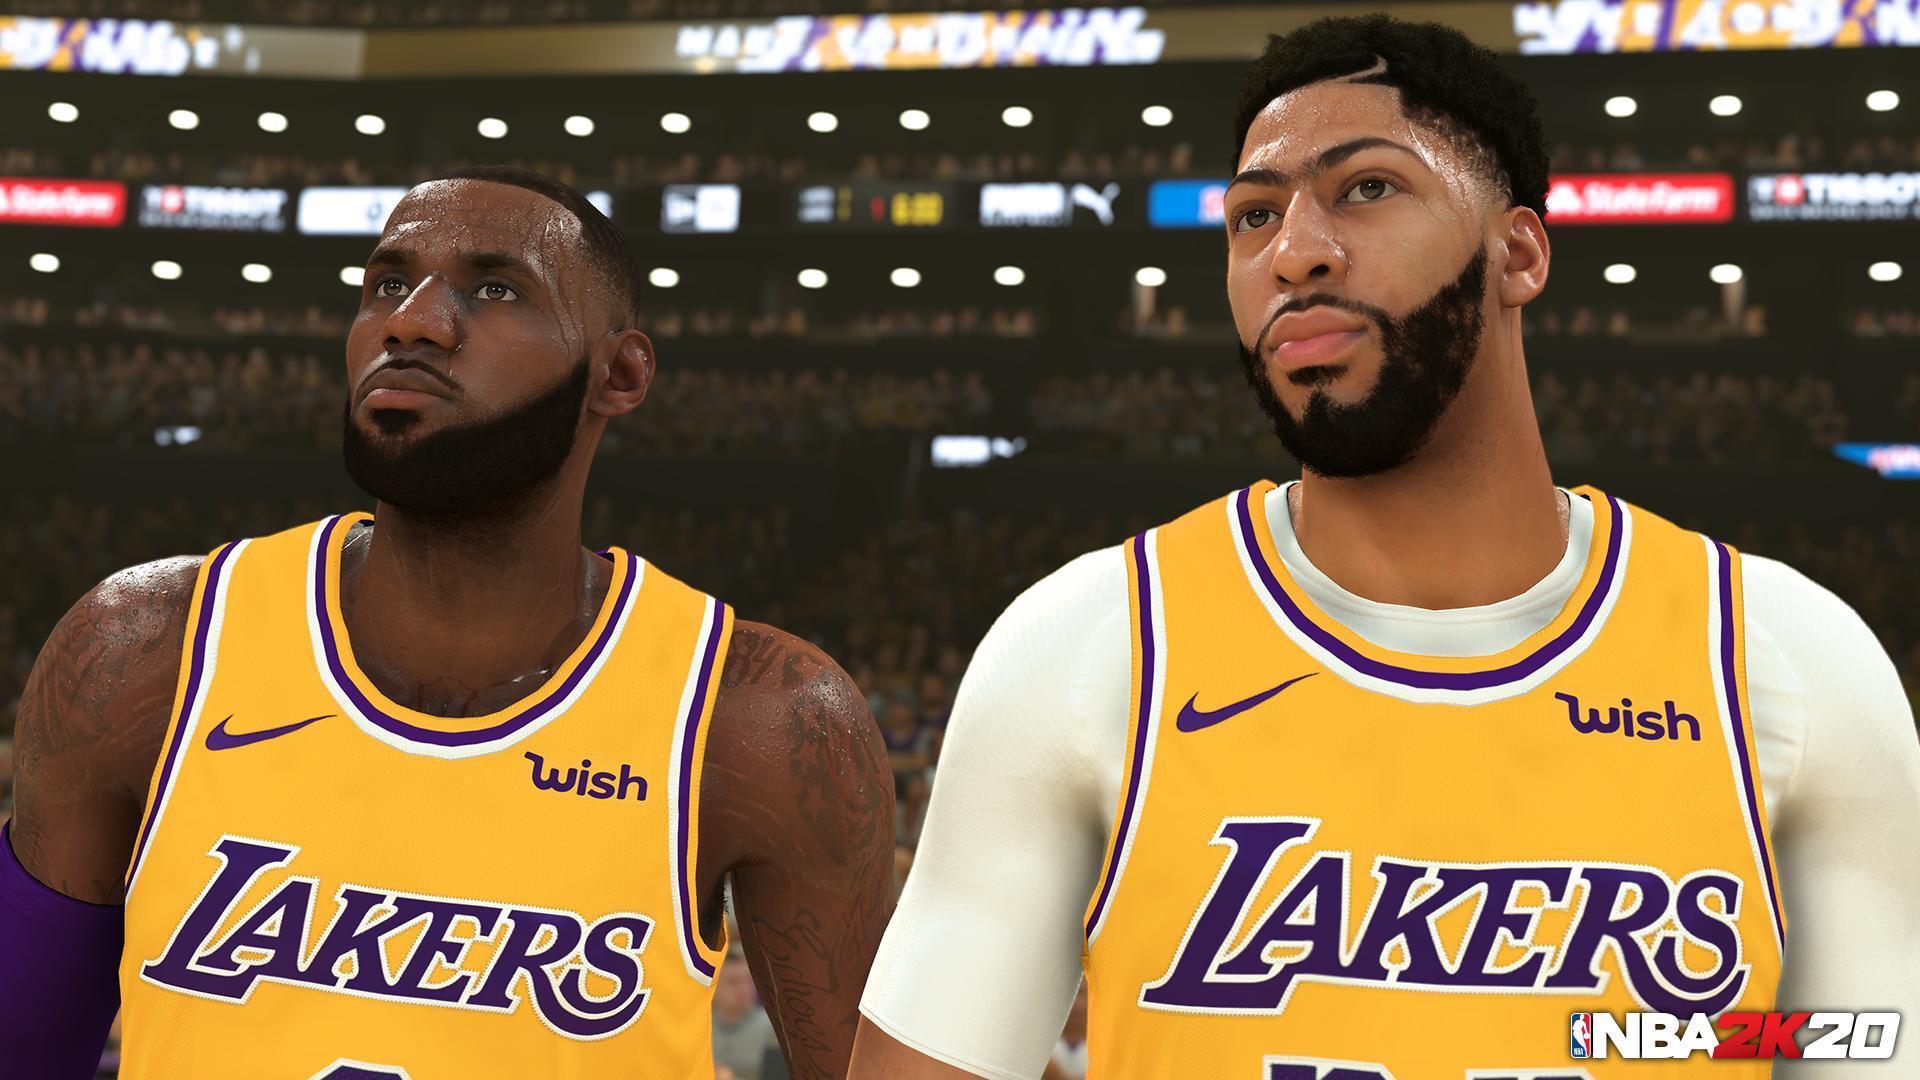 NBA 2K20 LeBron James Anthony Davis